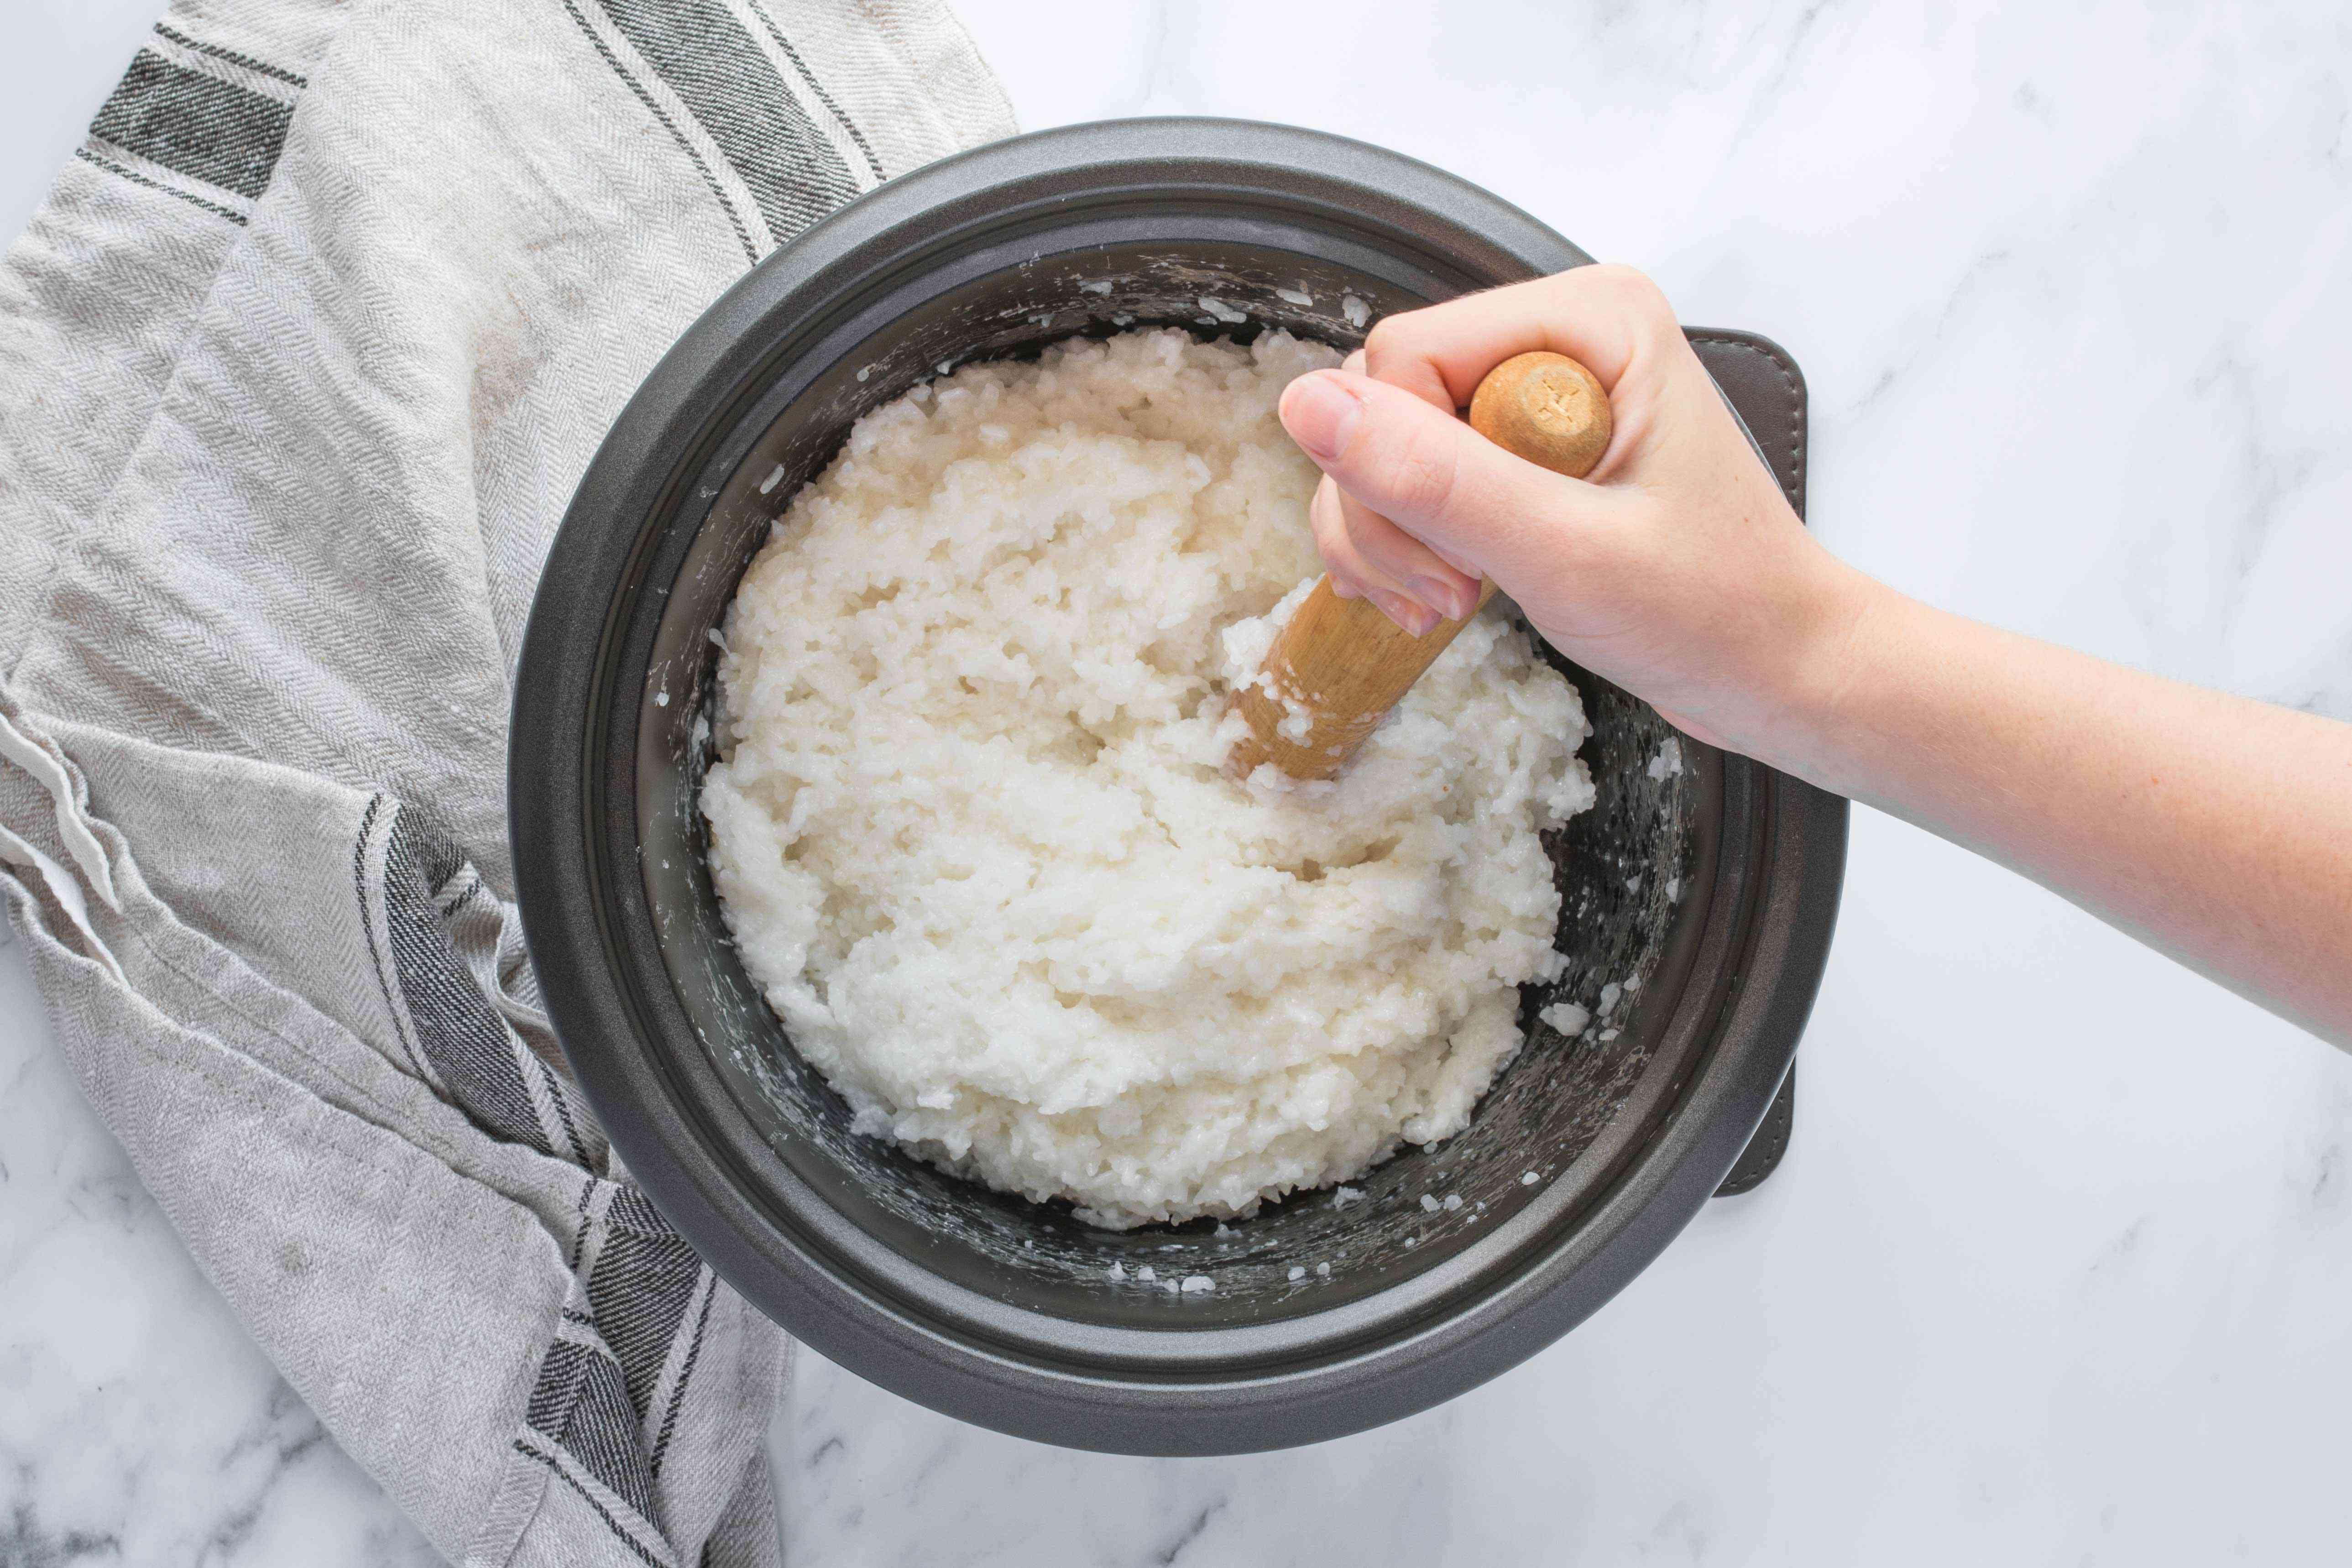 Mash the rice